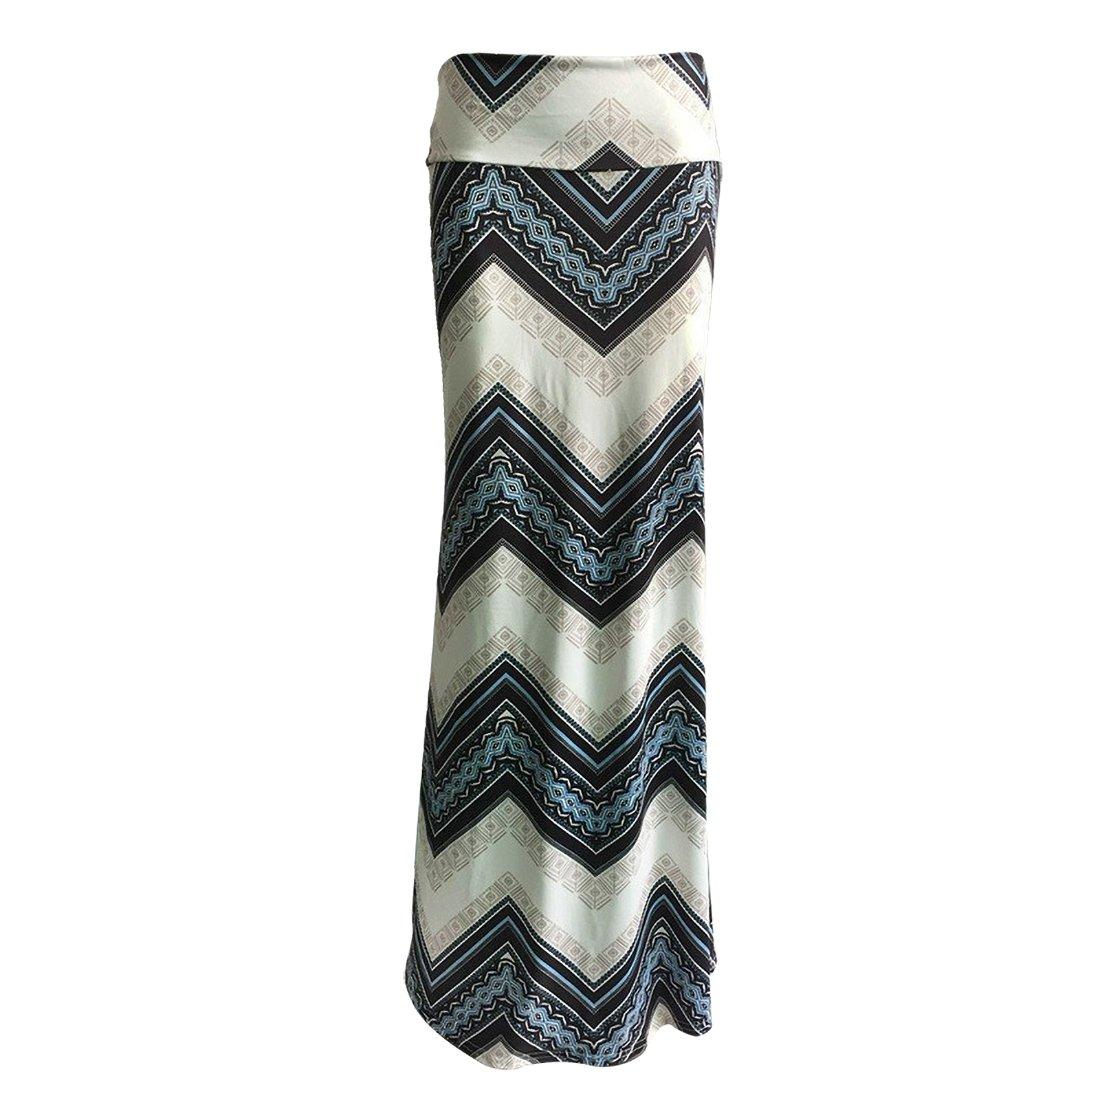 Blue Printed High Waist Maxi Skirt Plus Size Floor-Length Summer Casual Long Skirts for Women (XXL (US 10))